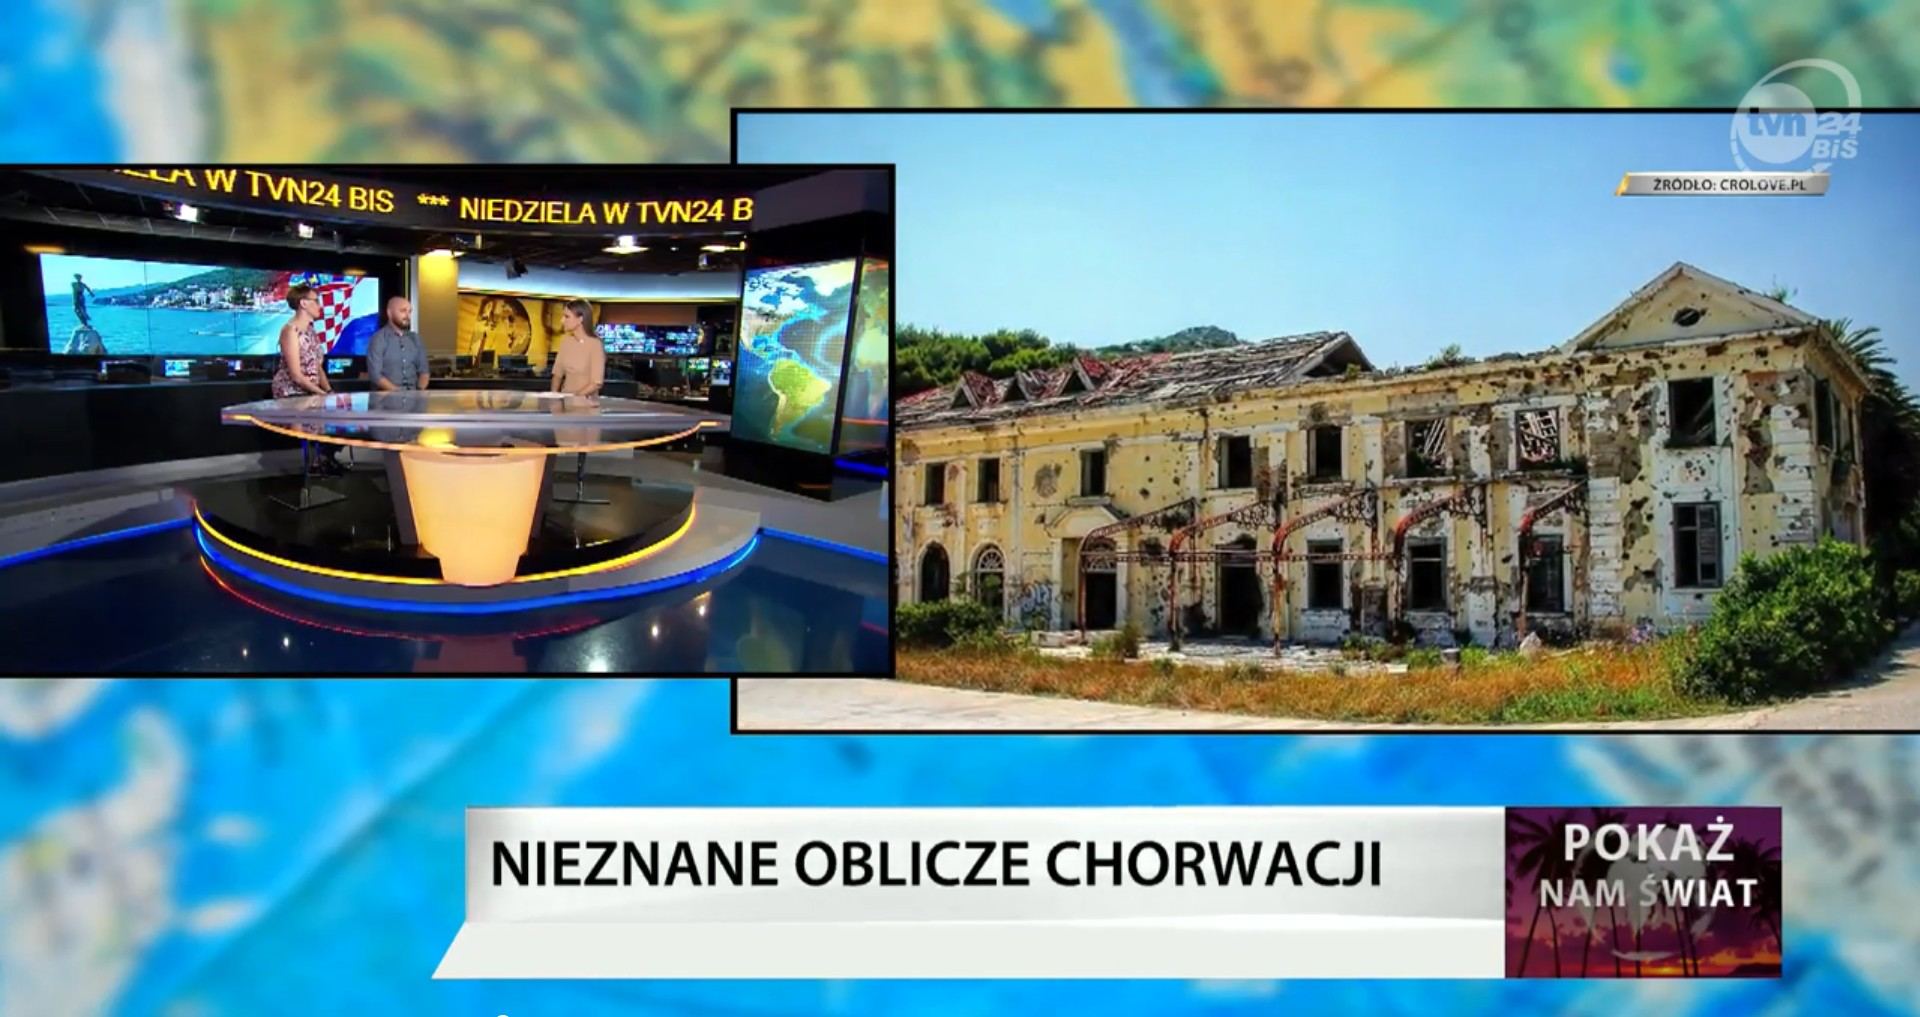 CroLove w TVN24BiS